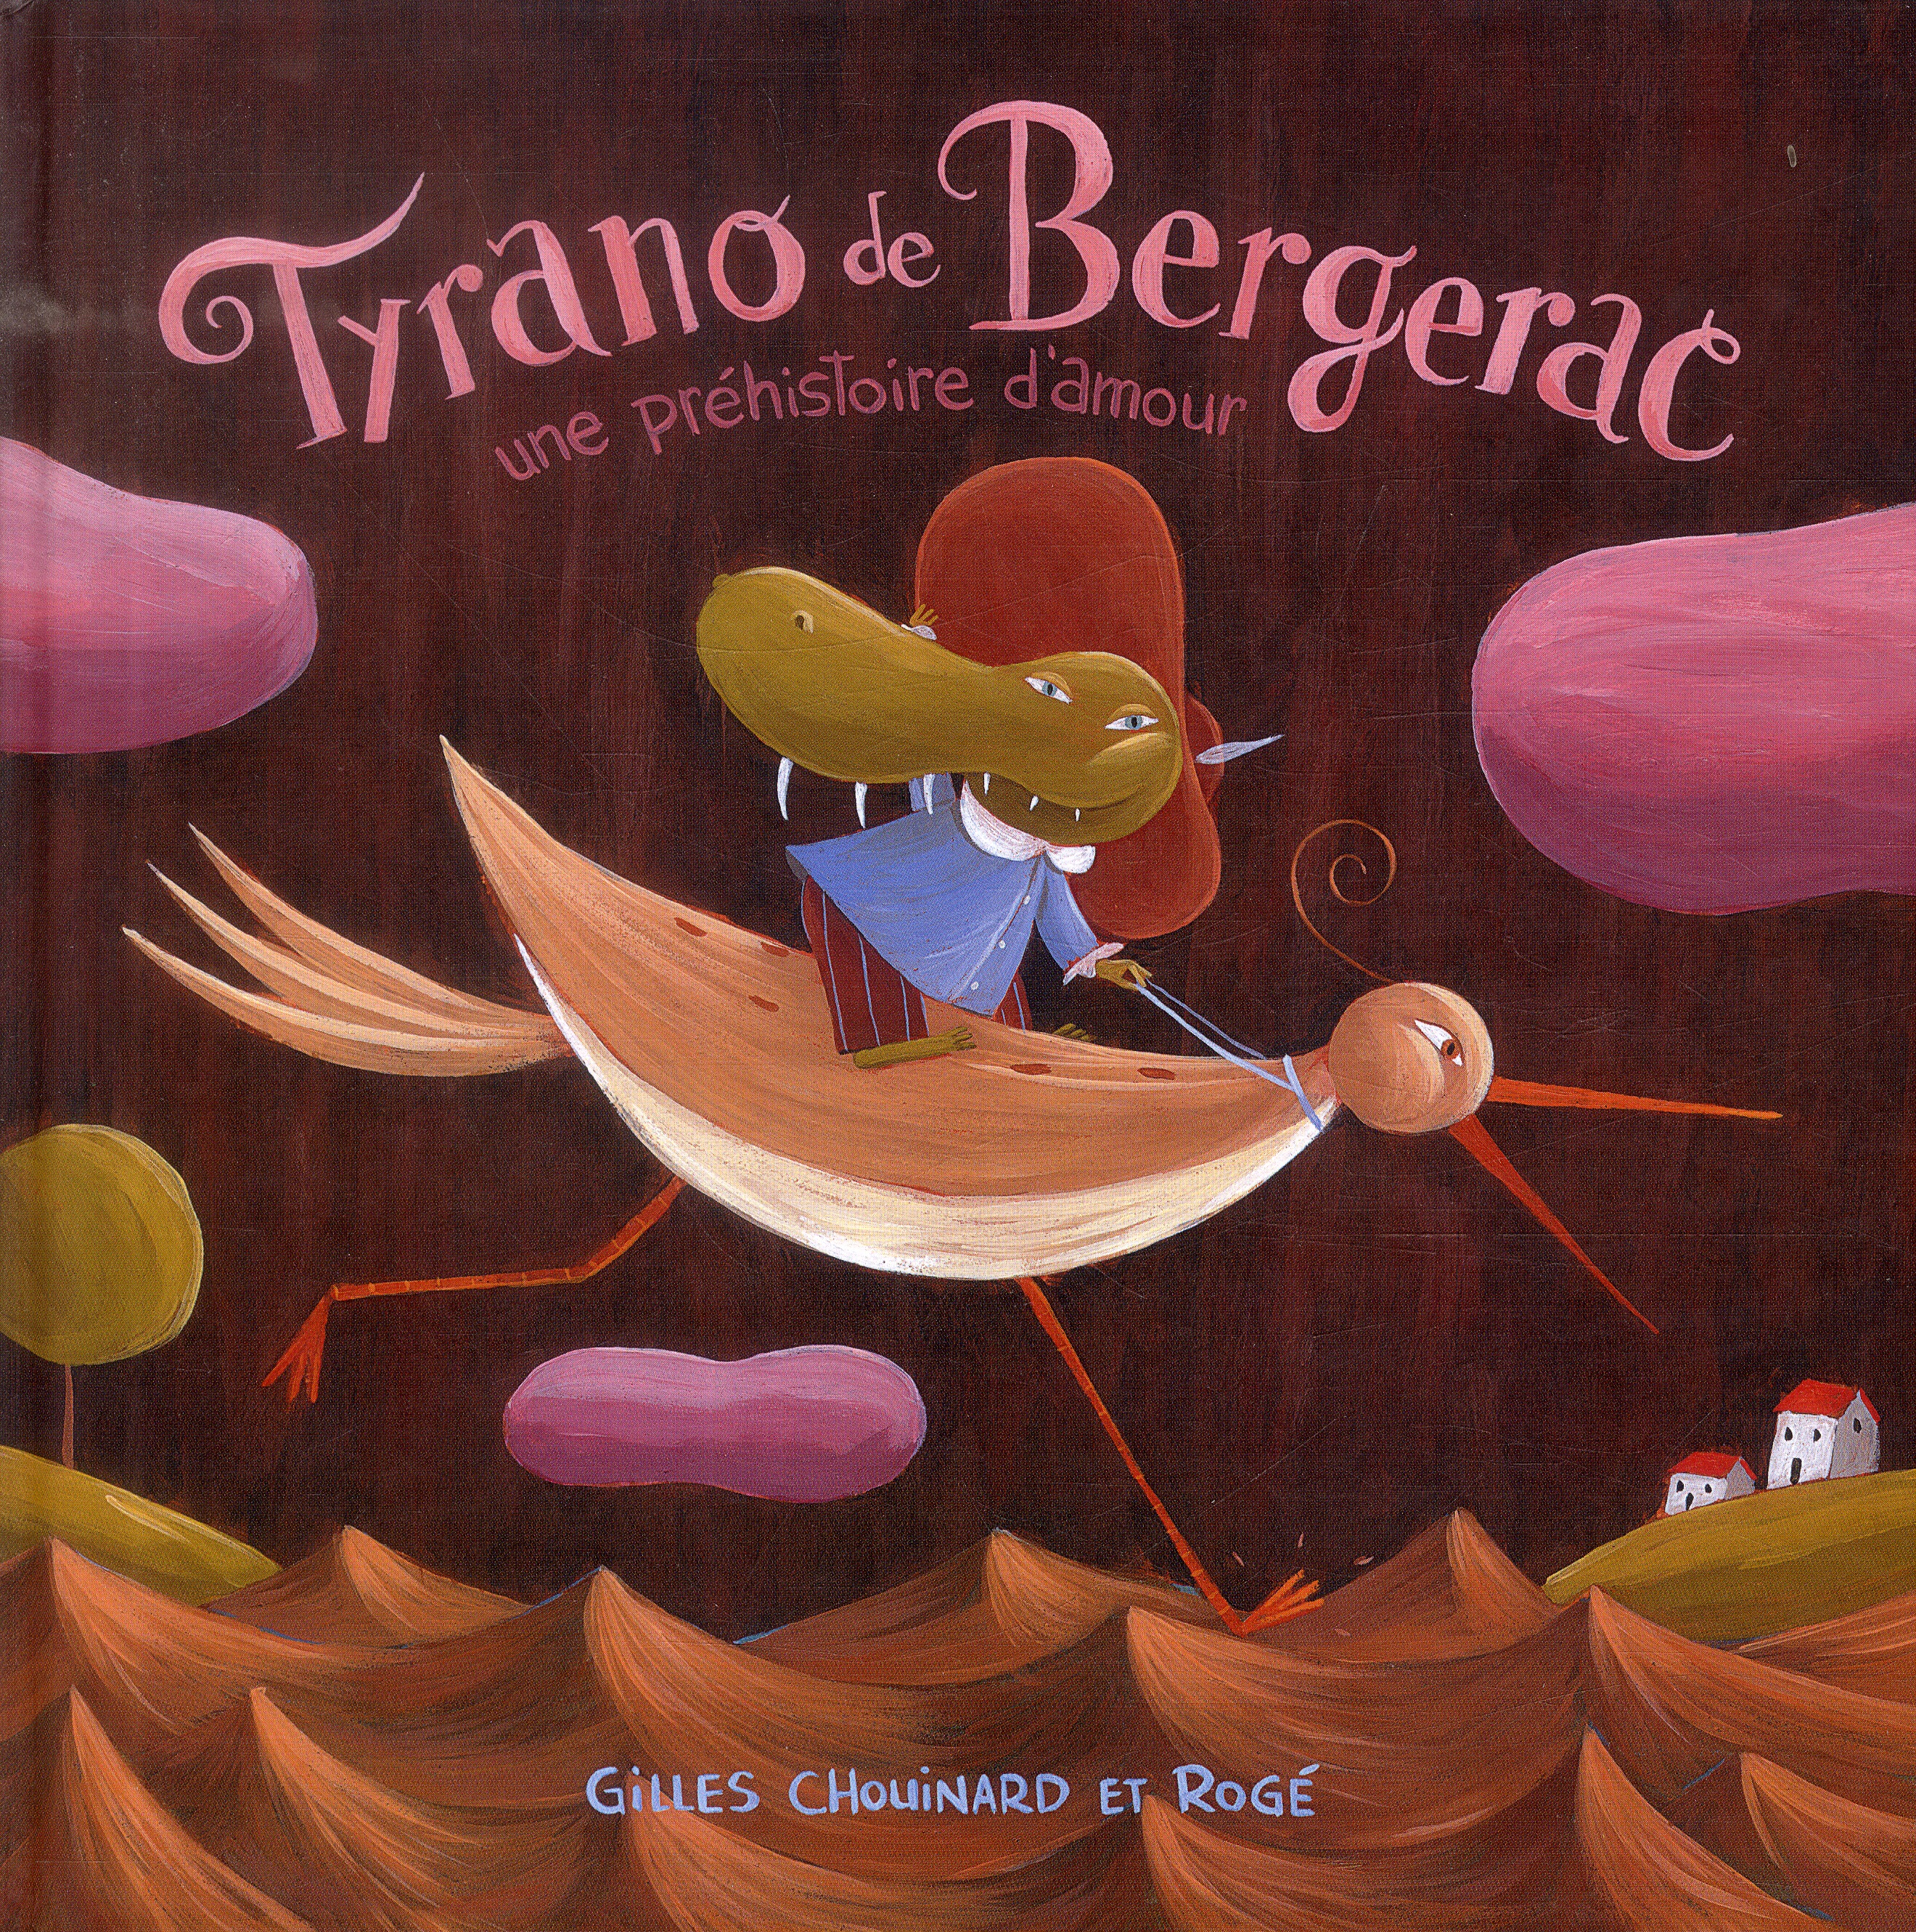 TYRANO DE BERGERAC - UNE PREHISTOIRE D'AMOUR